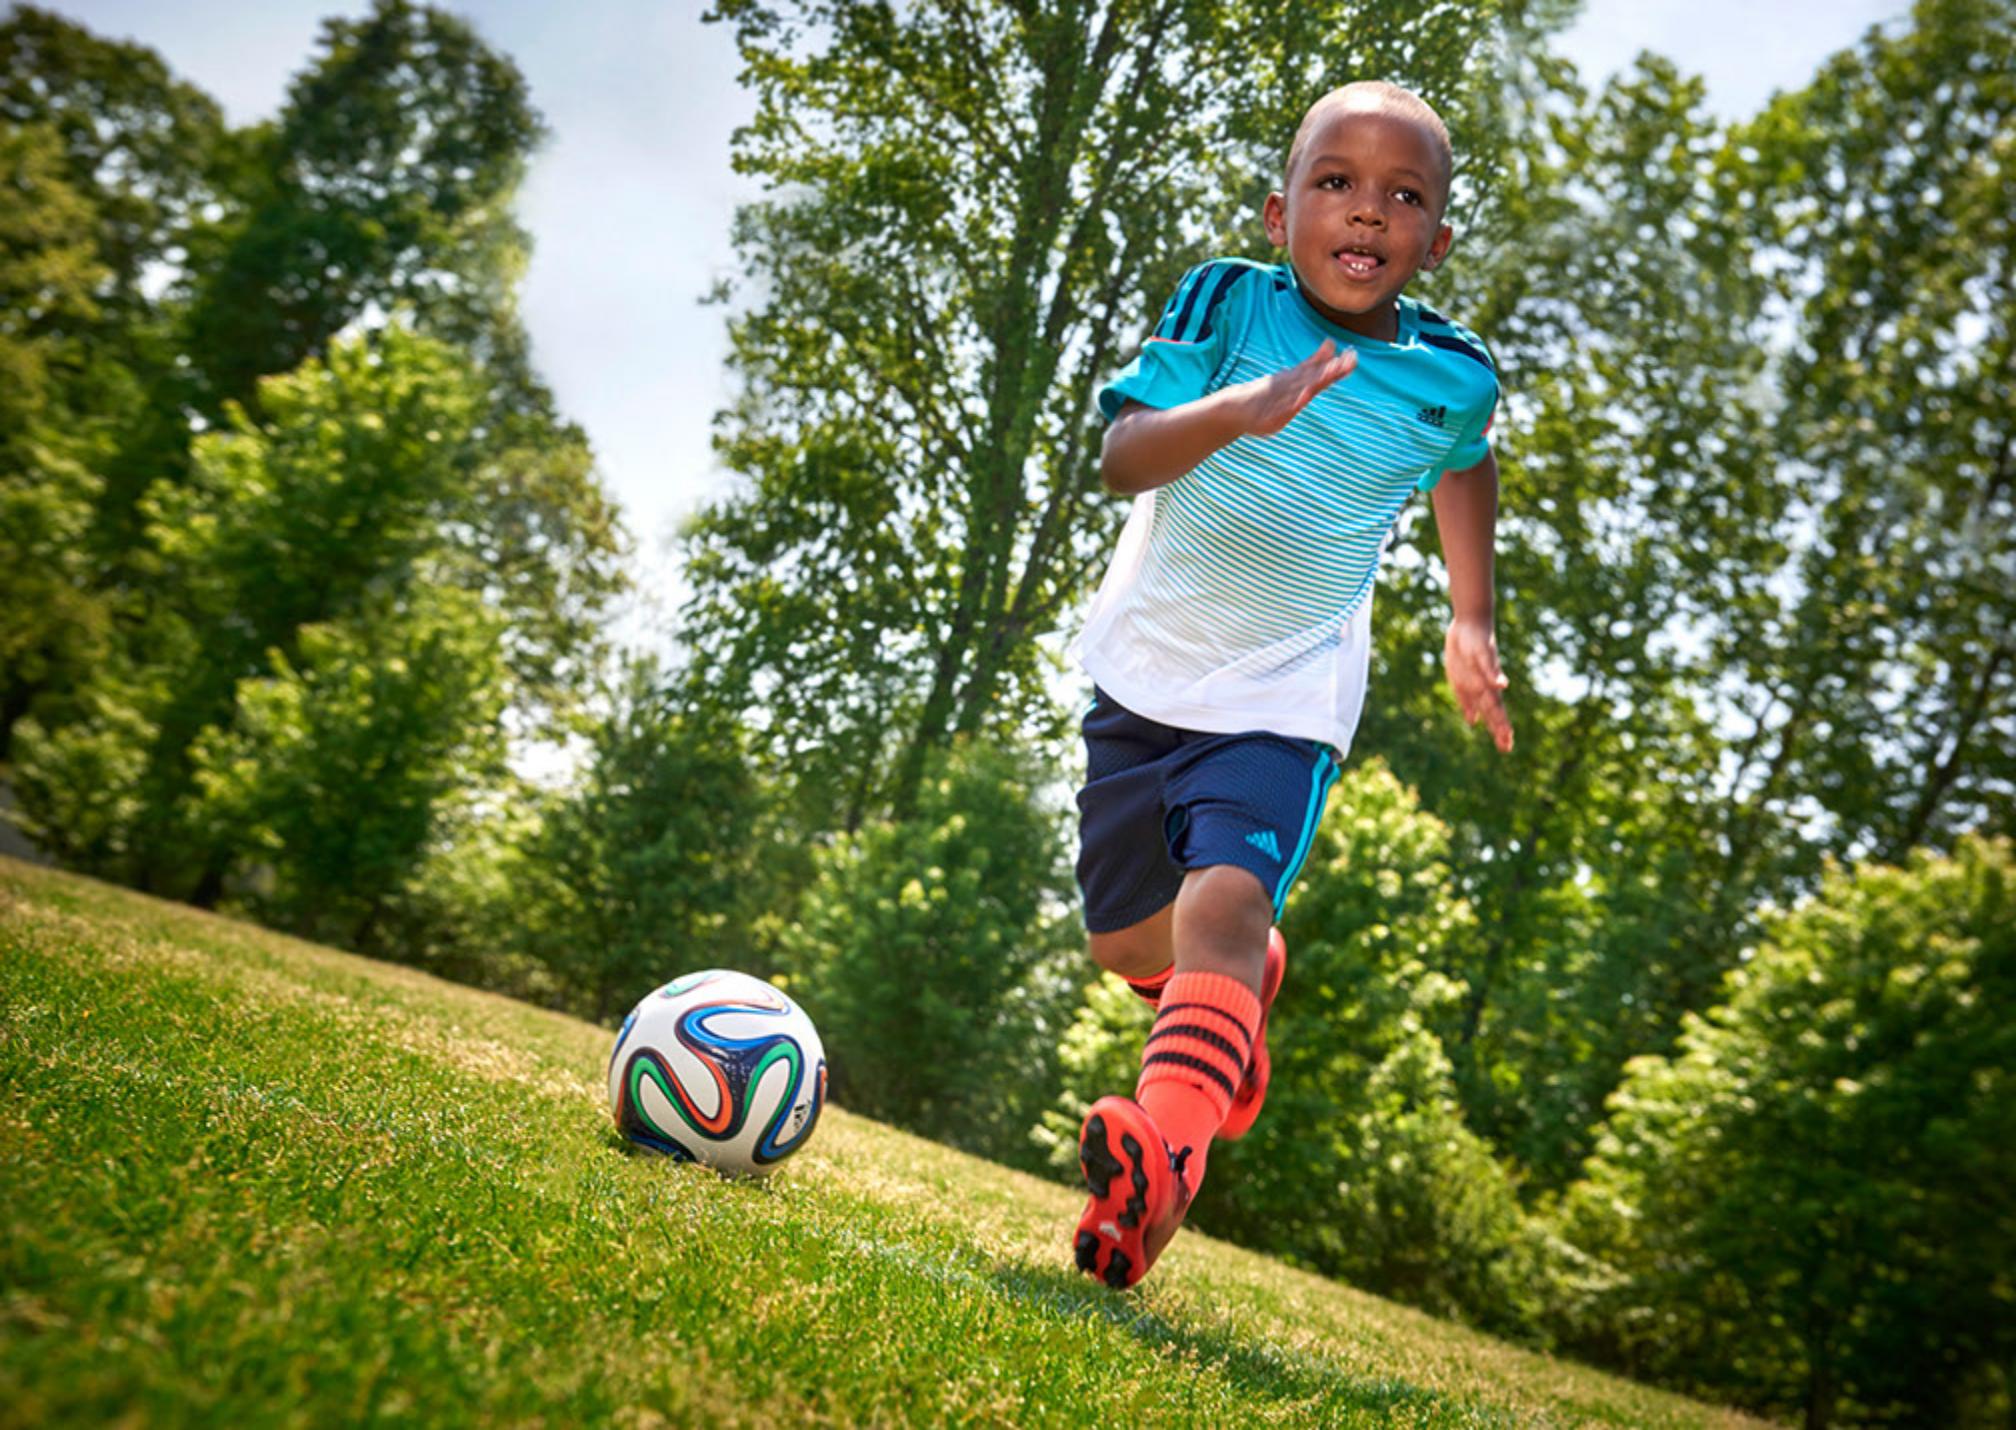 WO_Boy-Soccer Ball